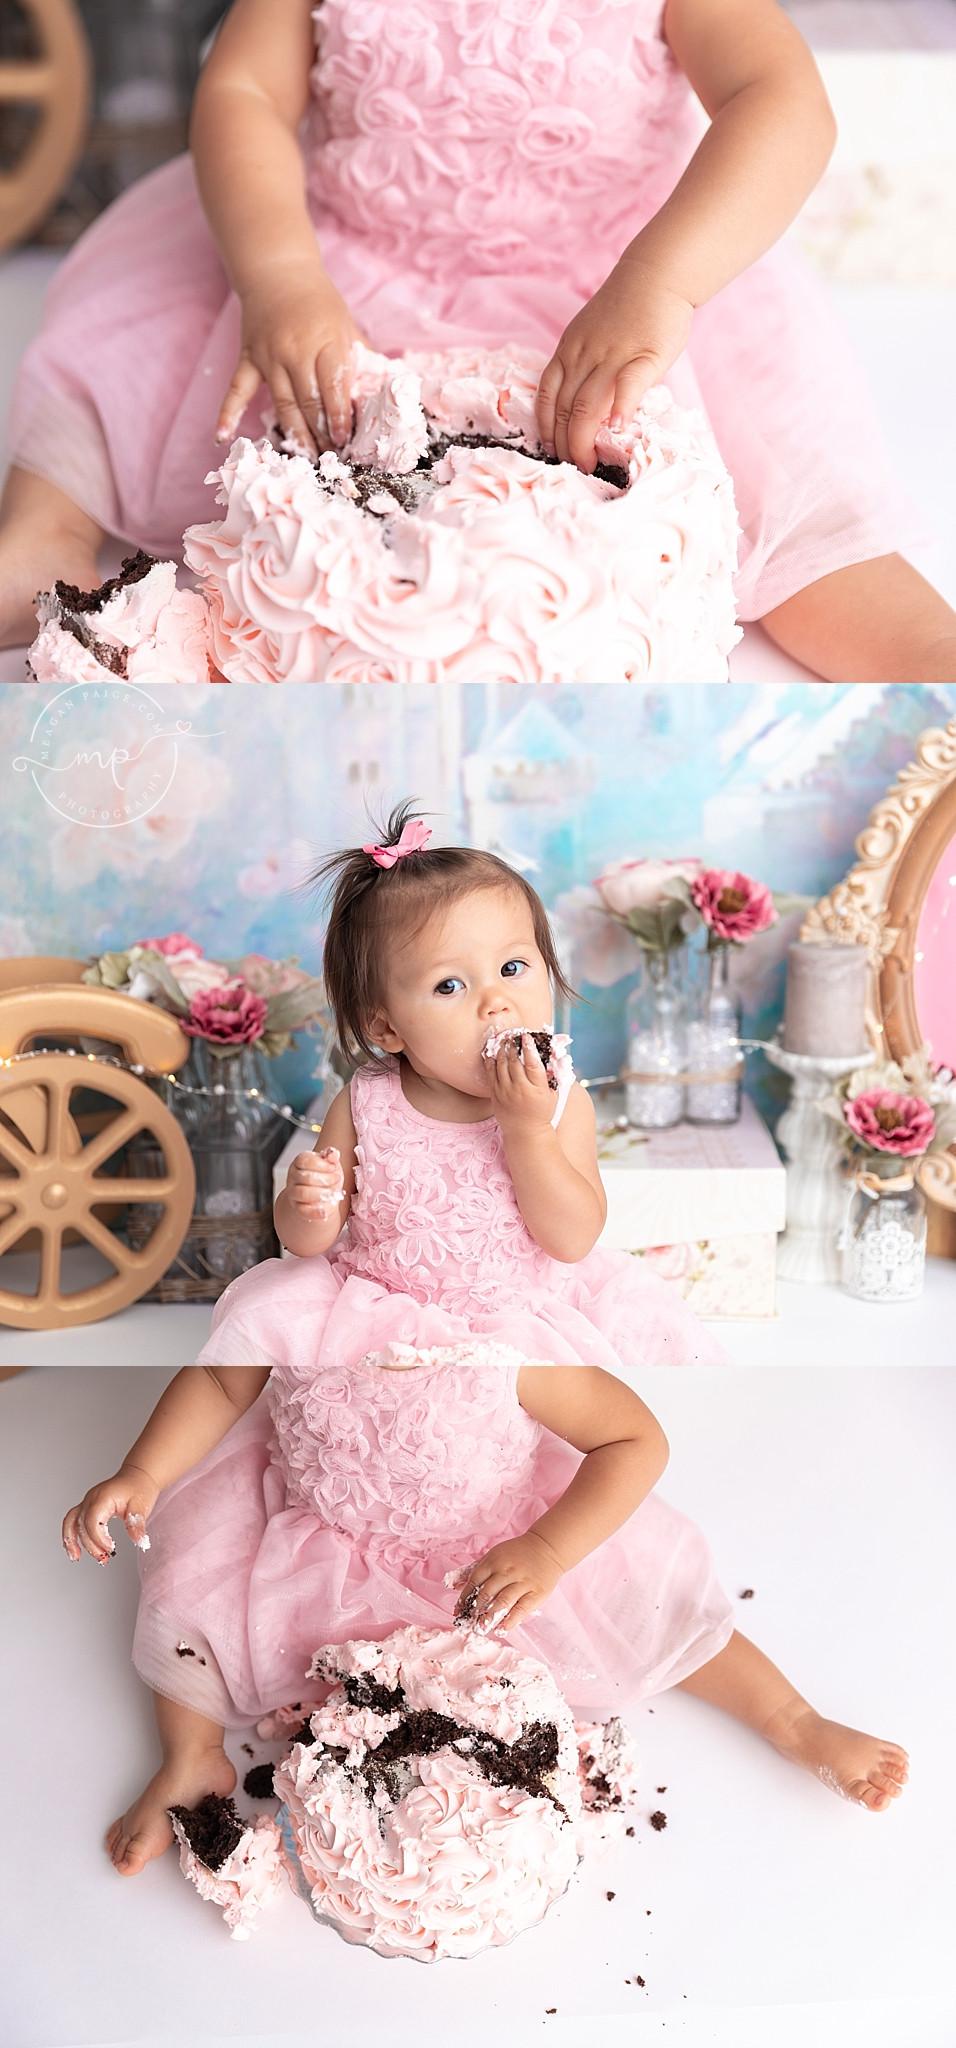 Princess Cake Smash - Calgary, AB - Meagan Paige Photography